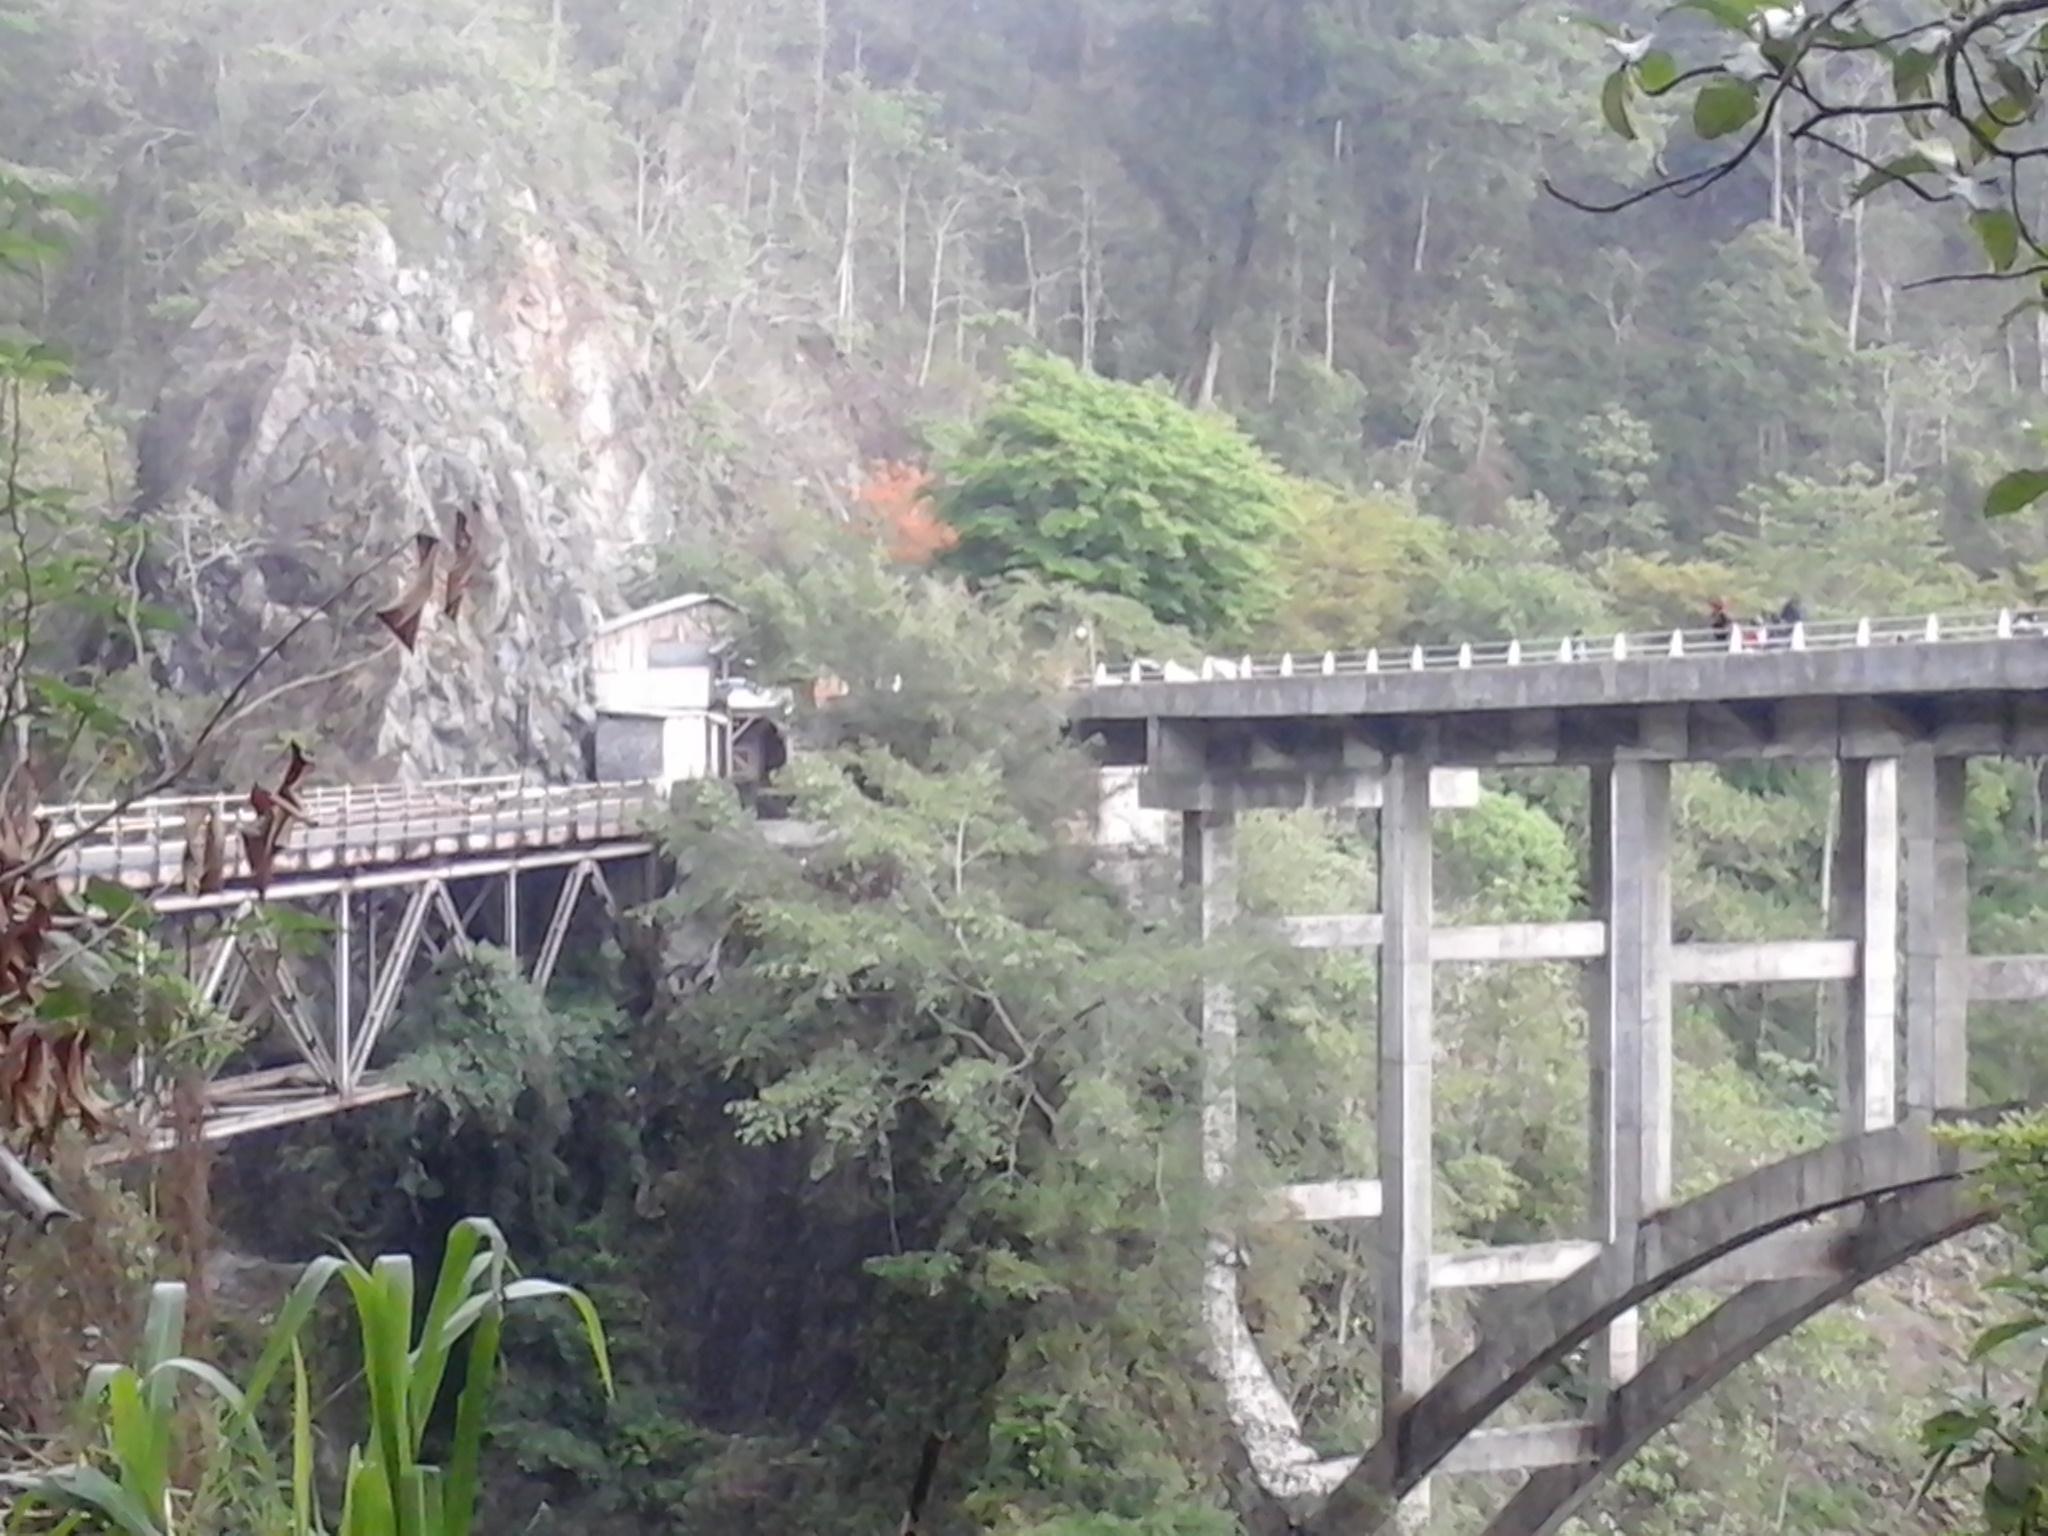 jembatan geladak perak piket nol.